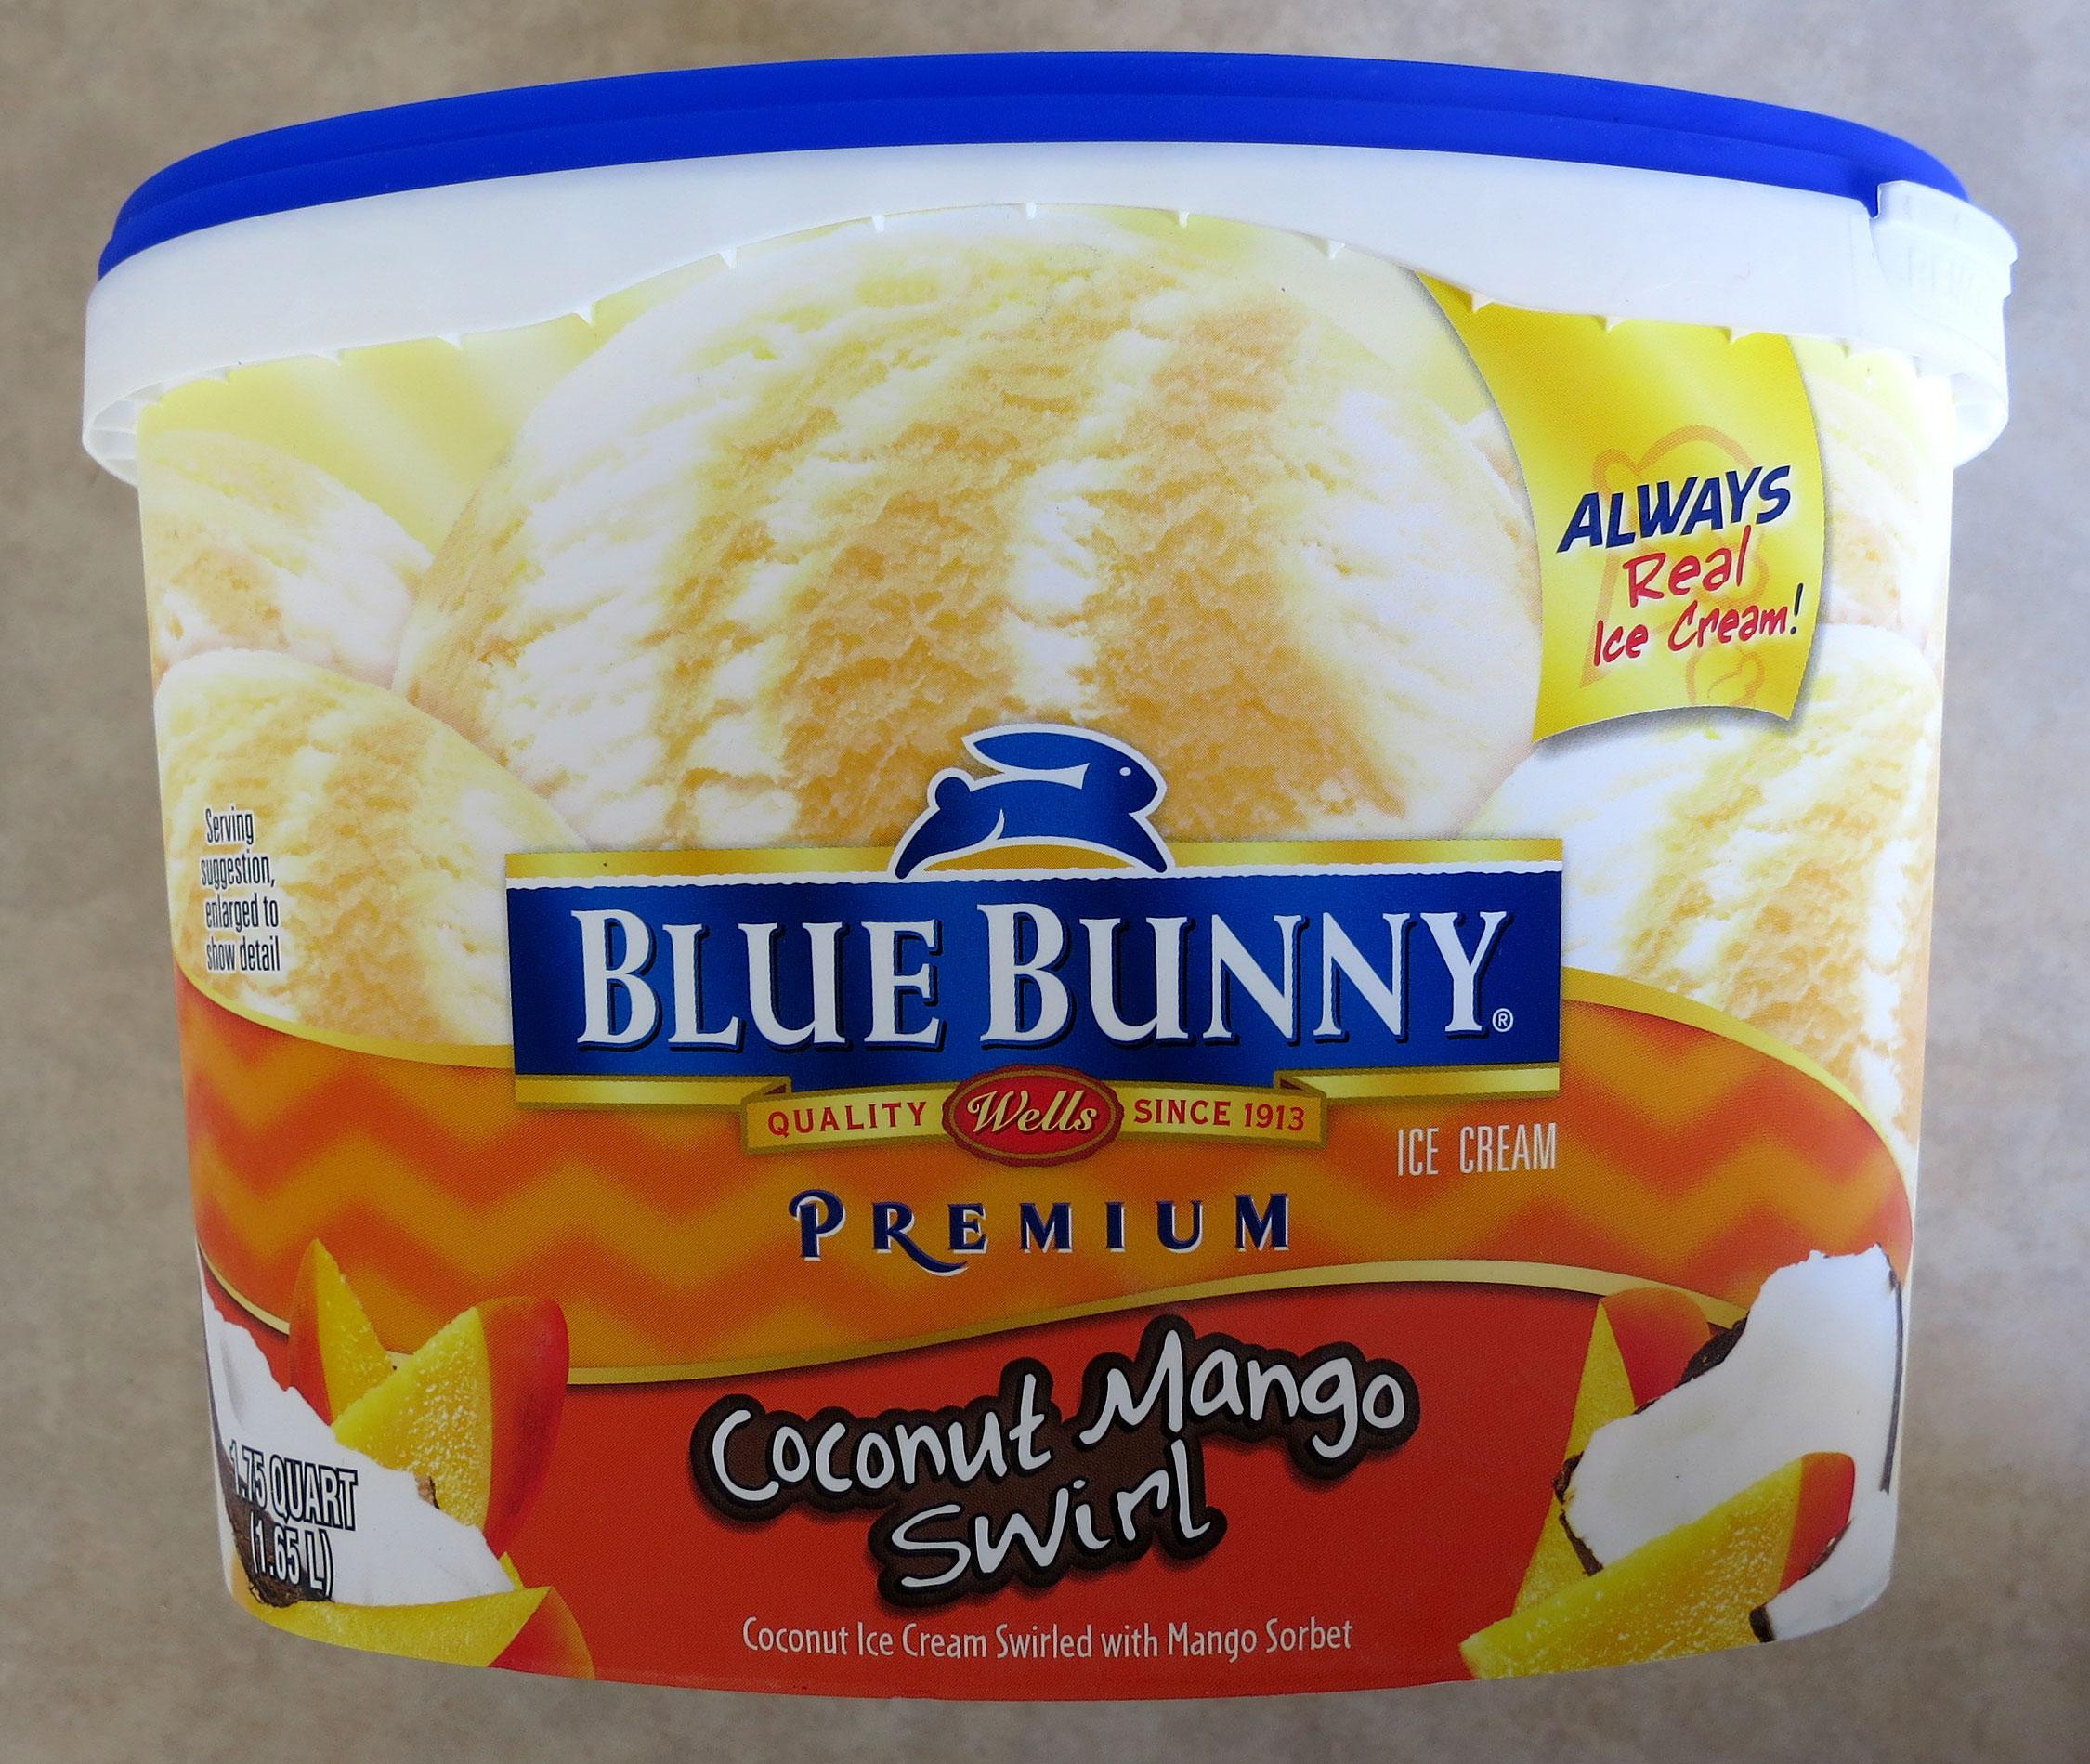 Coconut Mango: Review: Blue Bunny Coconut Mango Swirl